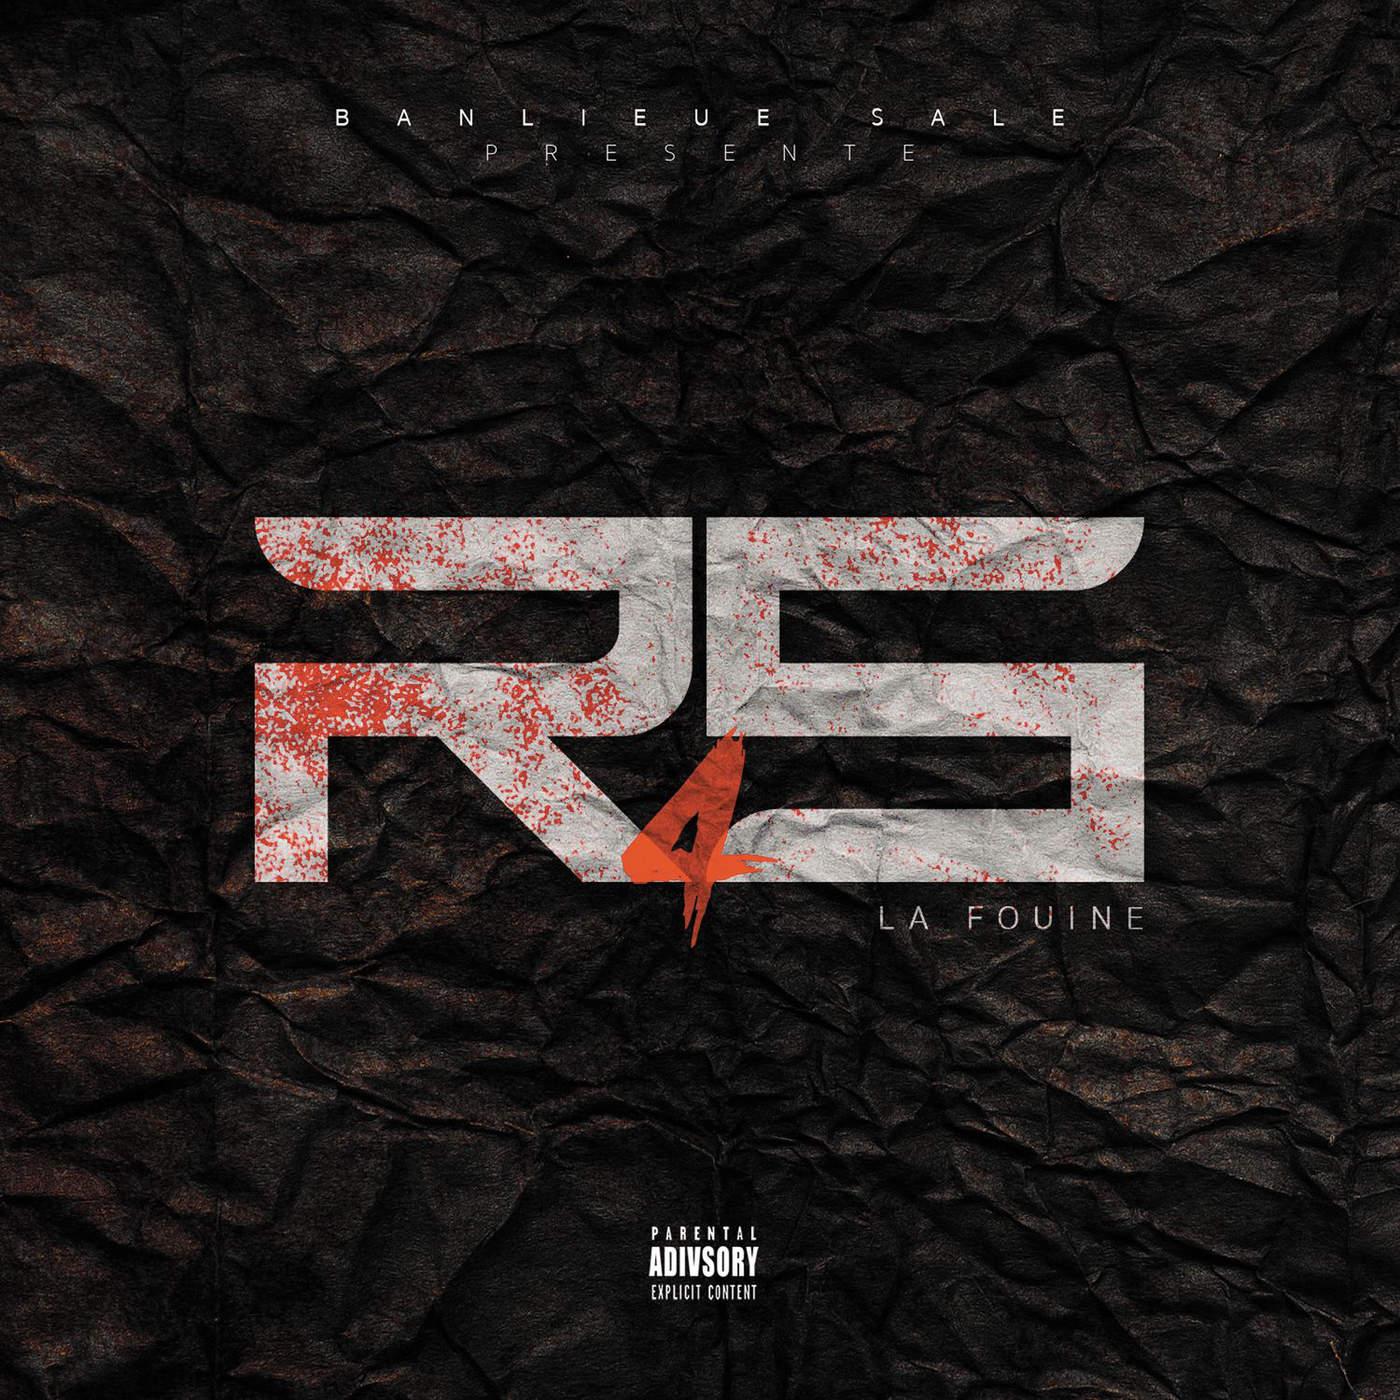 La Fouine - RS4 - Single Cover